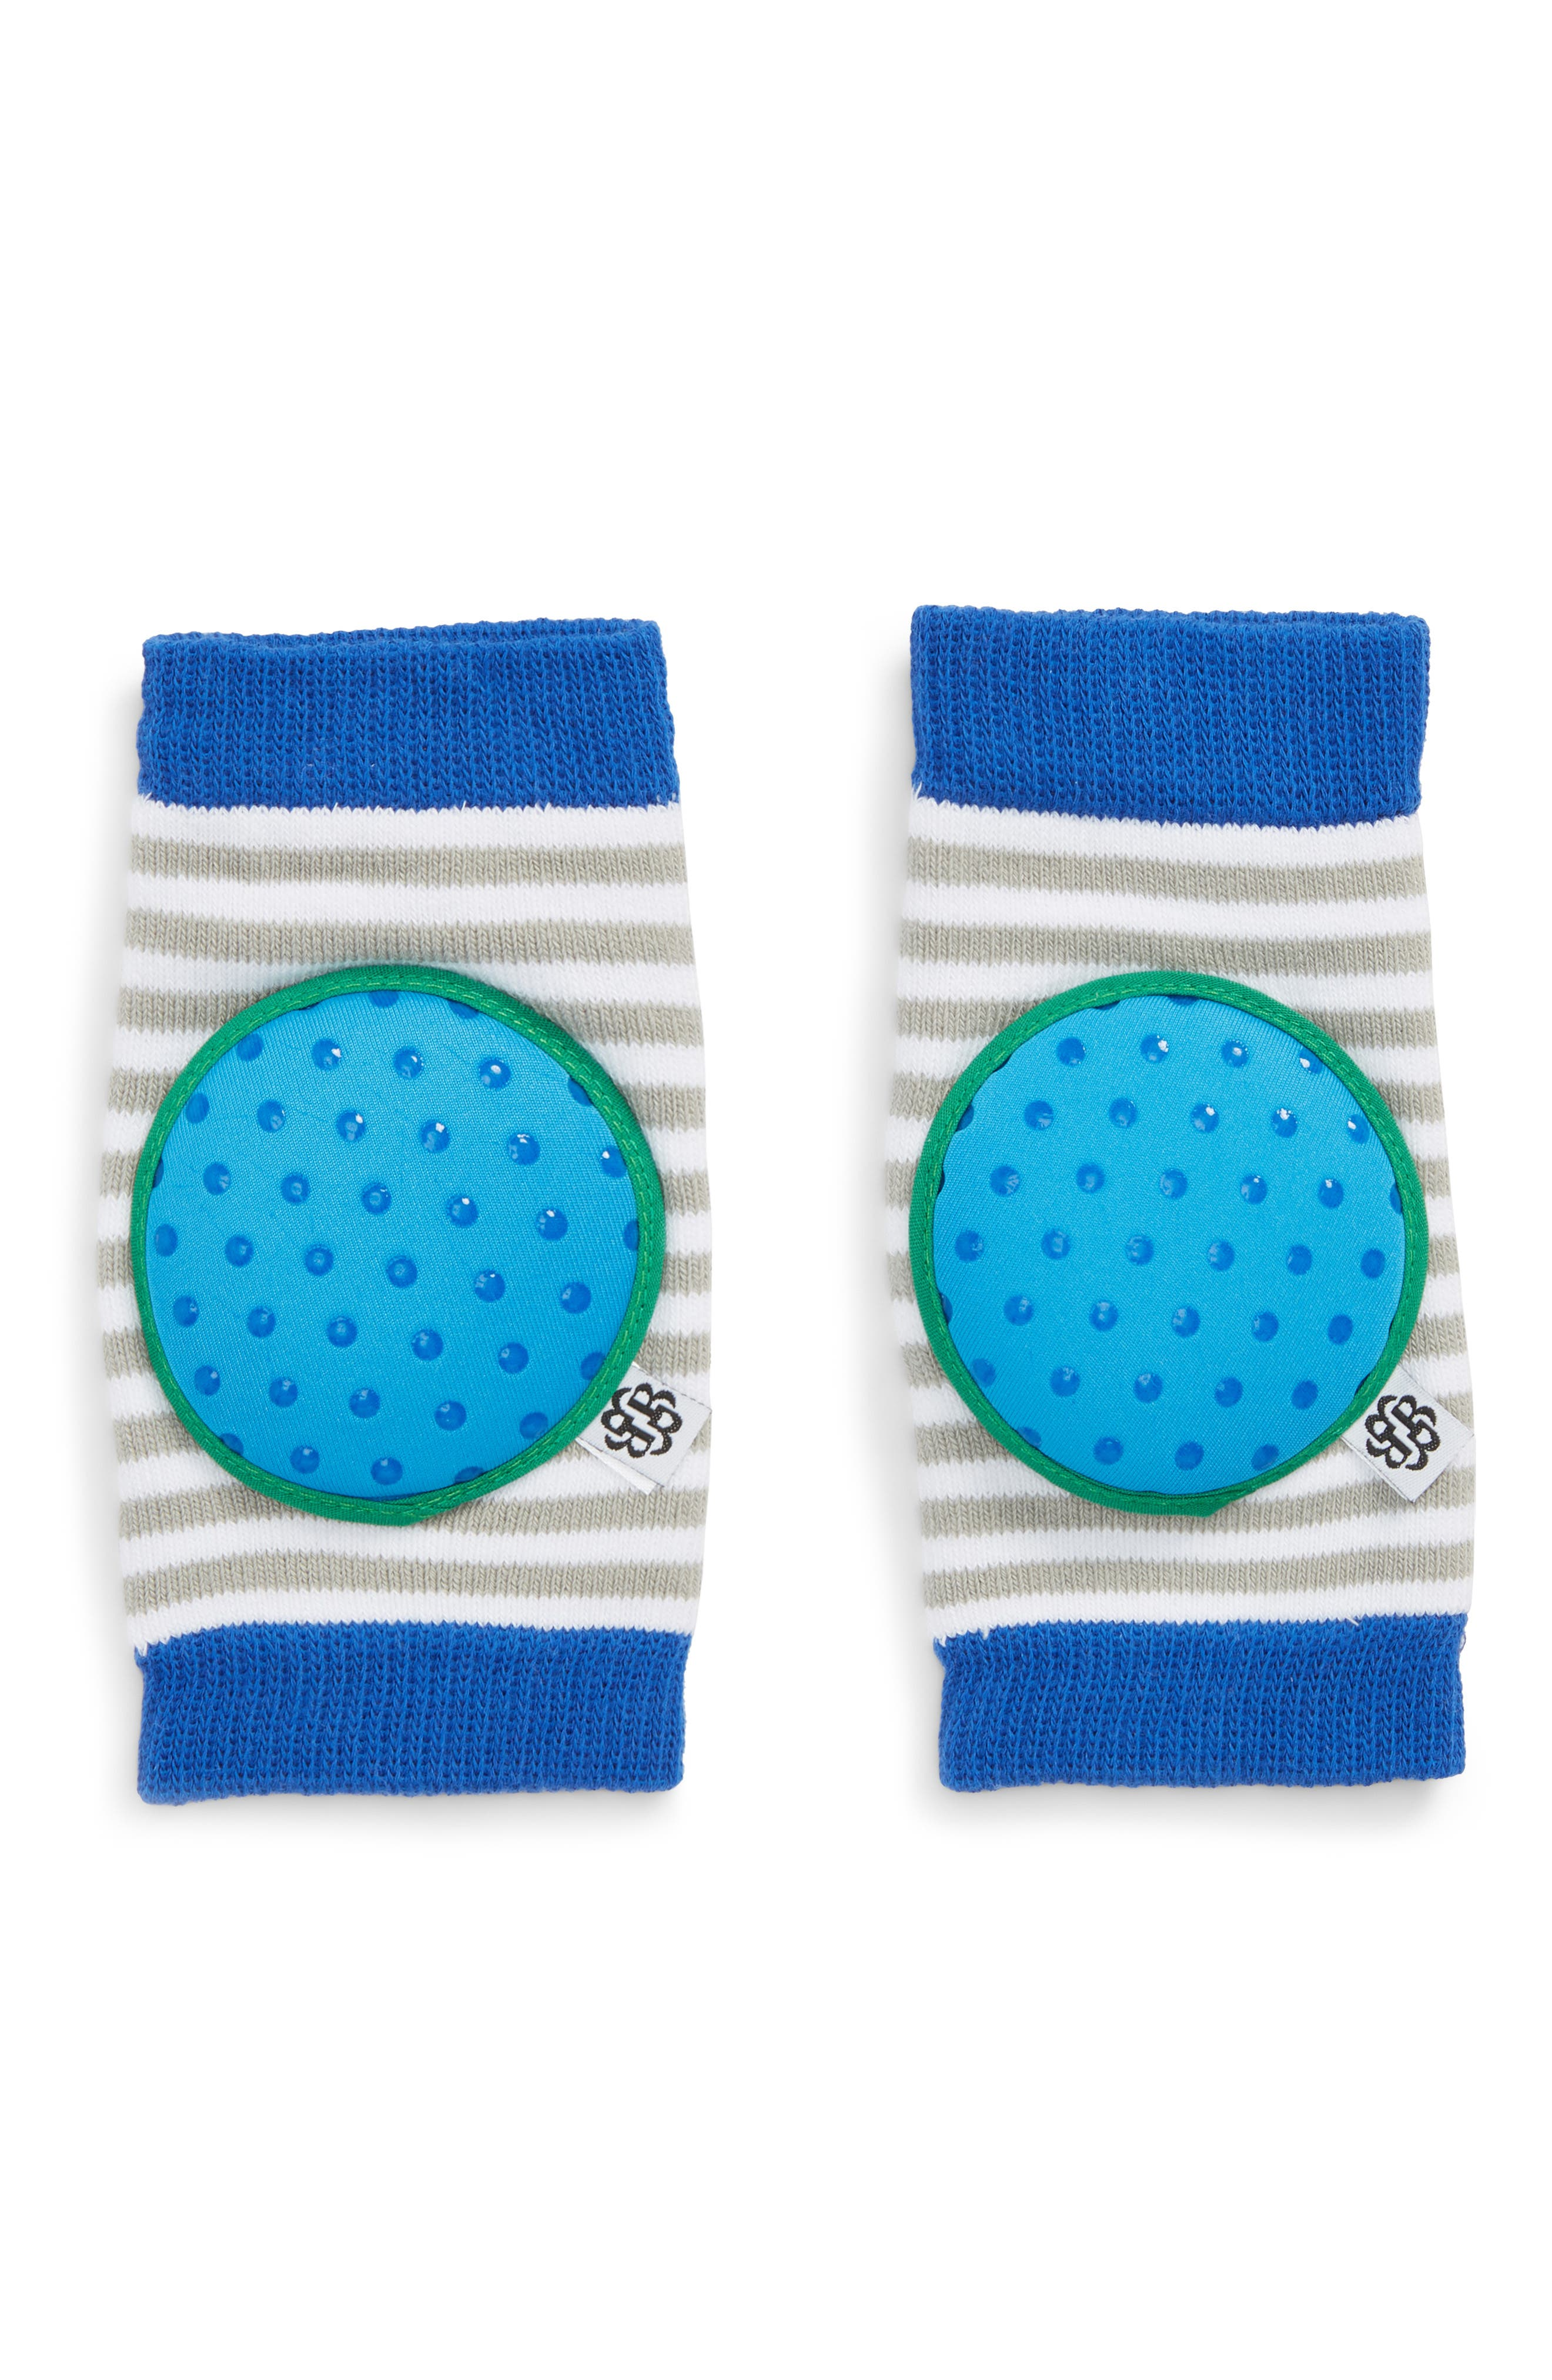 'Happy Knees' Protective Knee Pads,                         Main,                         color, Bingo Blue